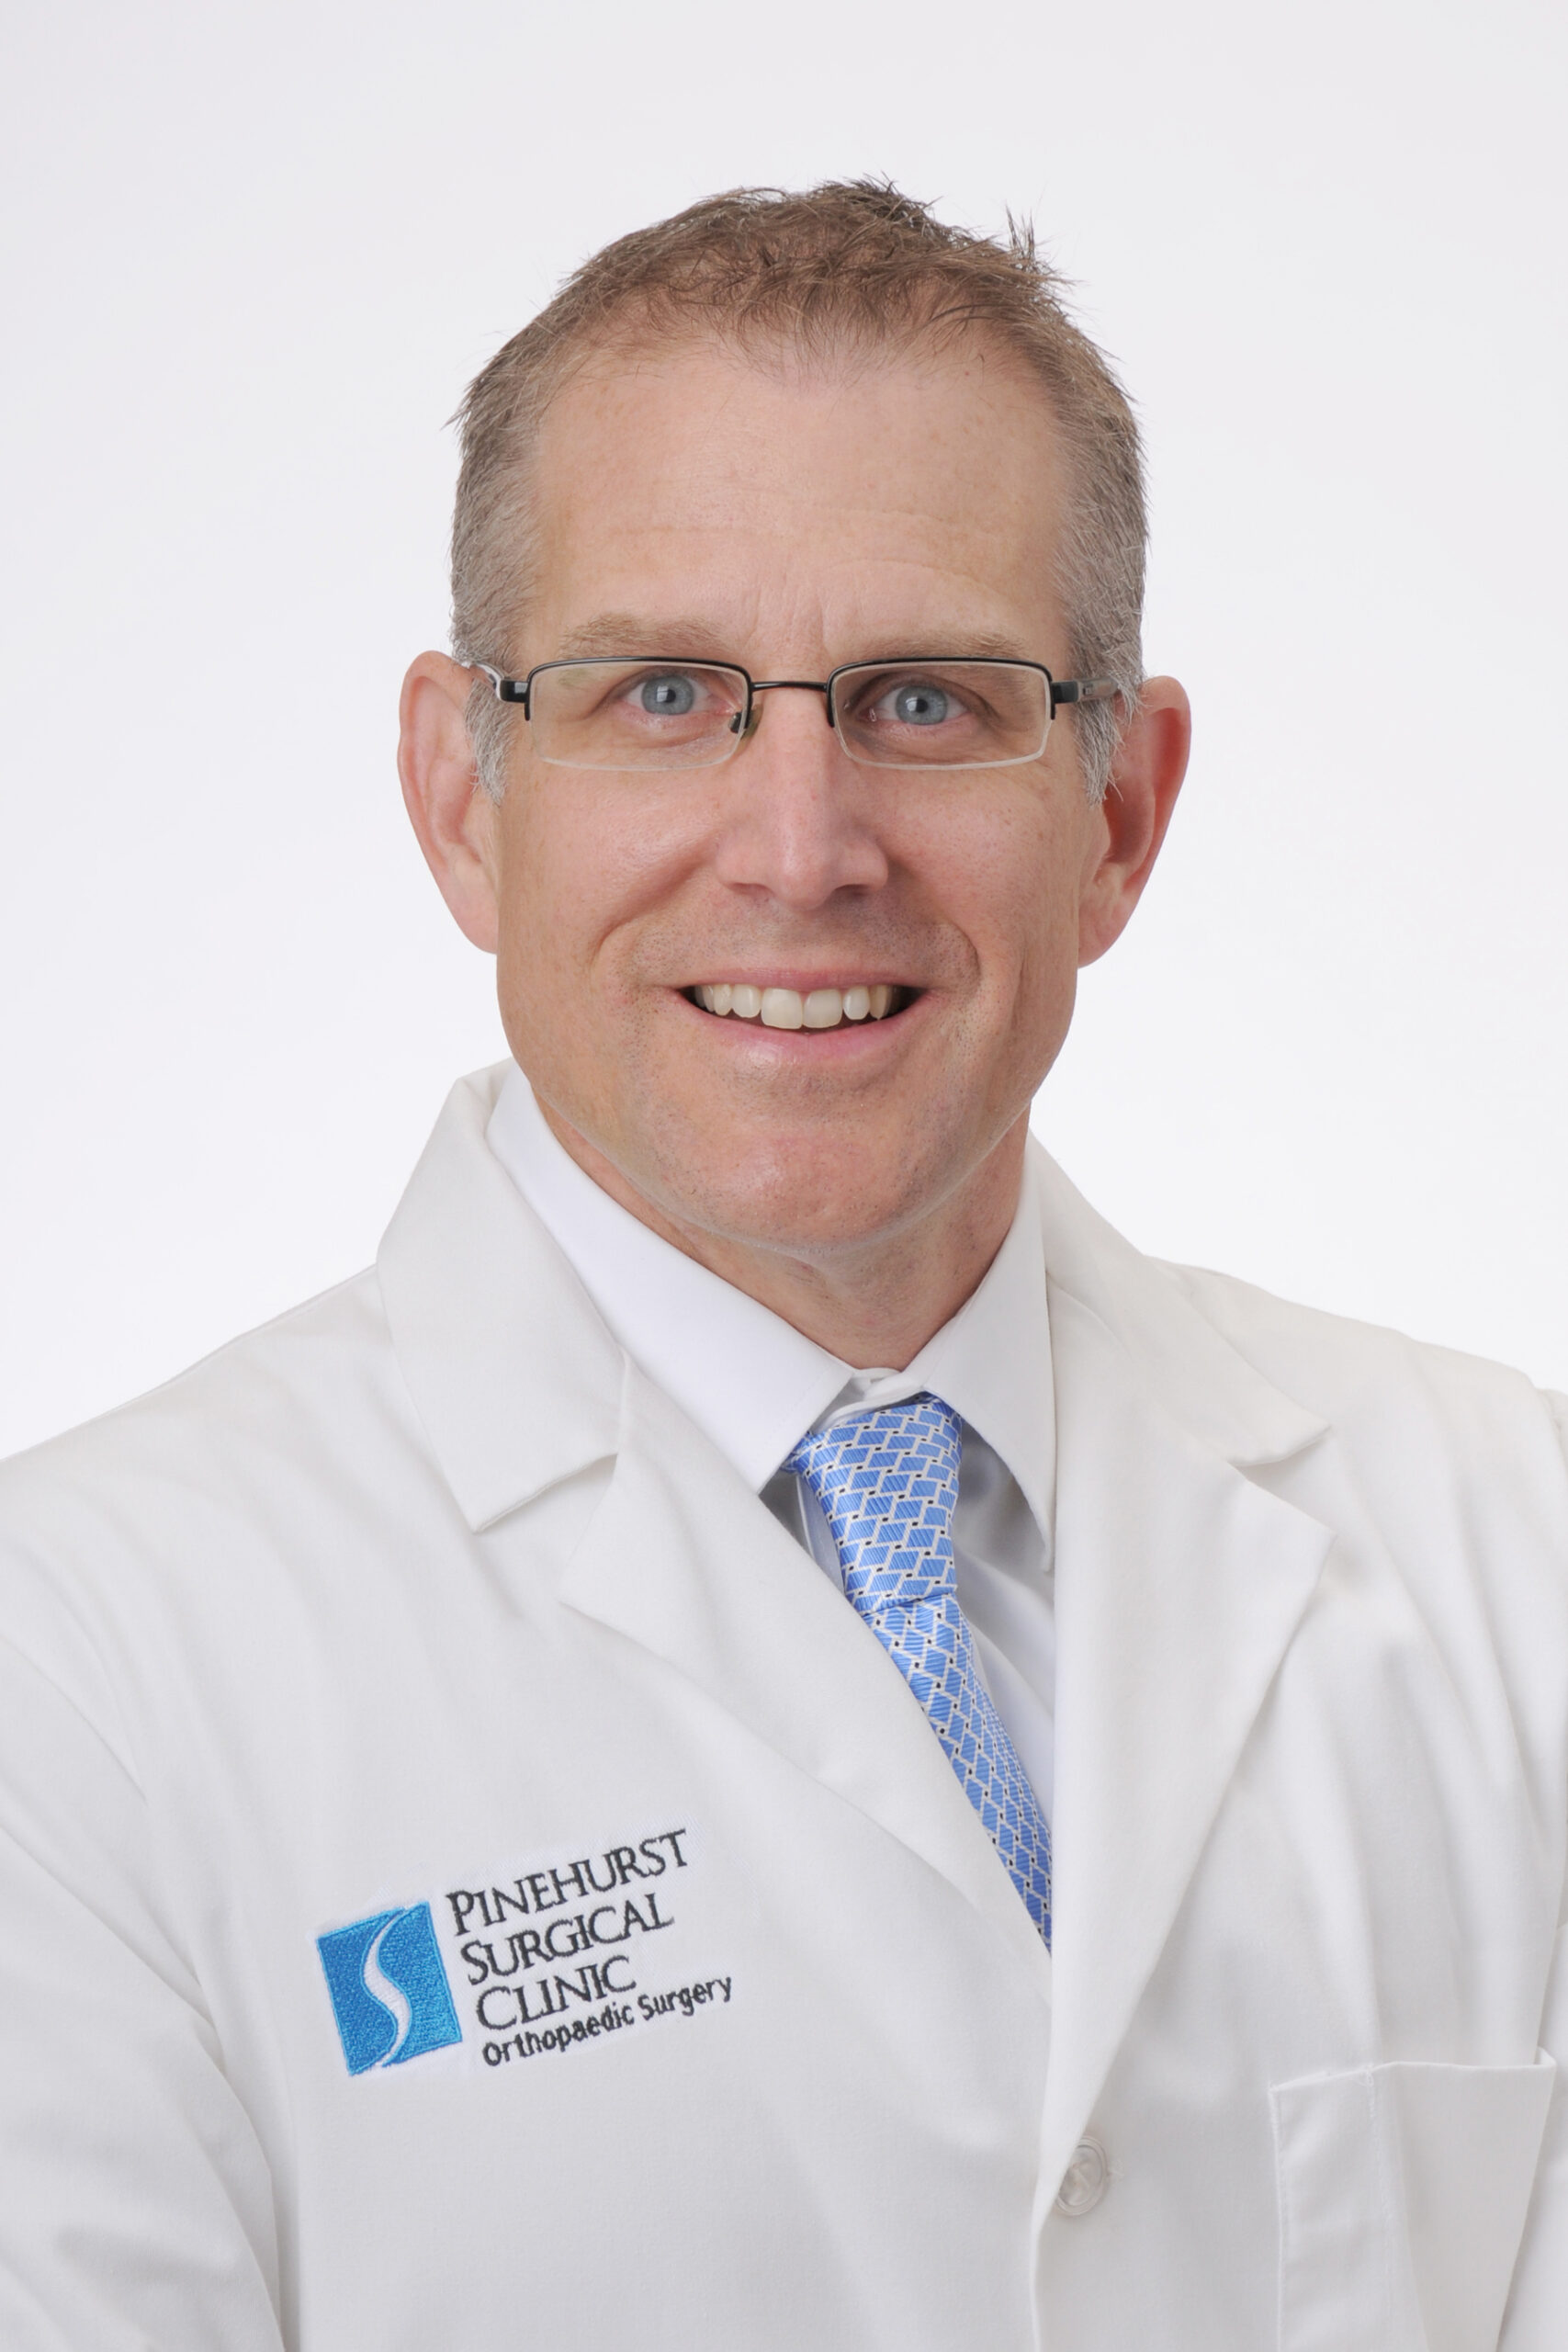 Chad Frazer Orthopaedic Surgery - Updated